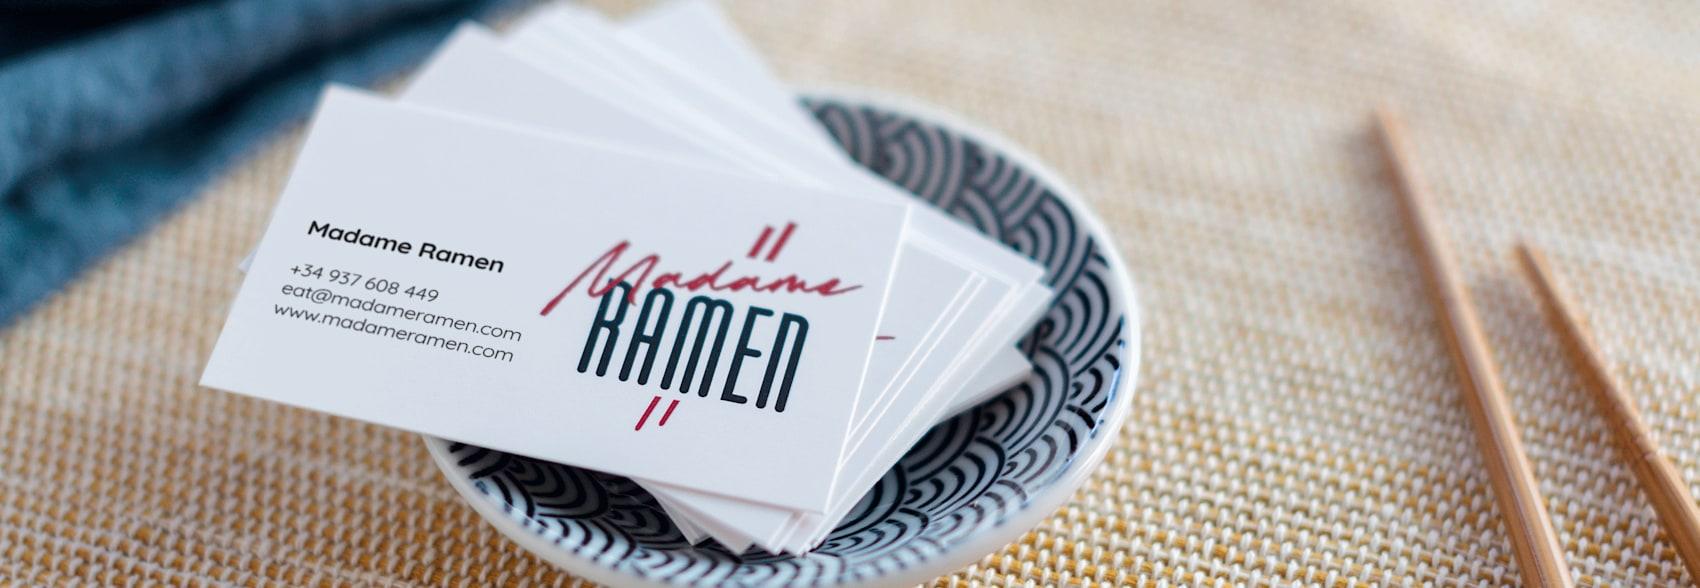 Make business cards